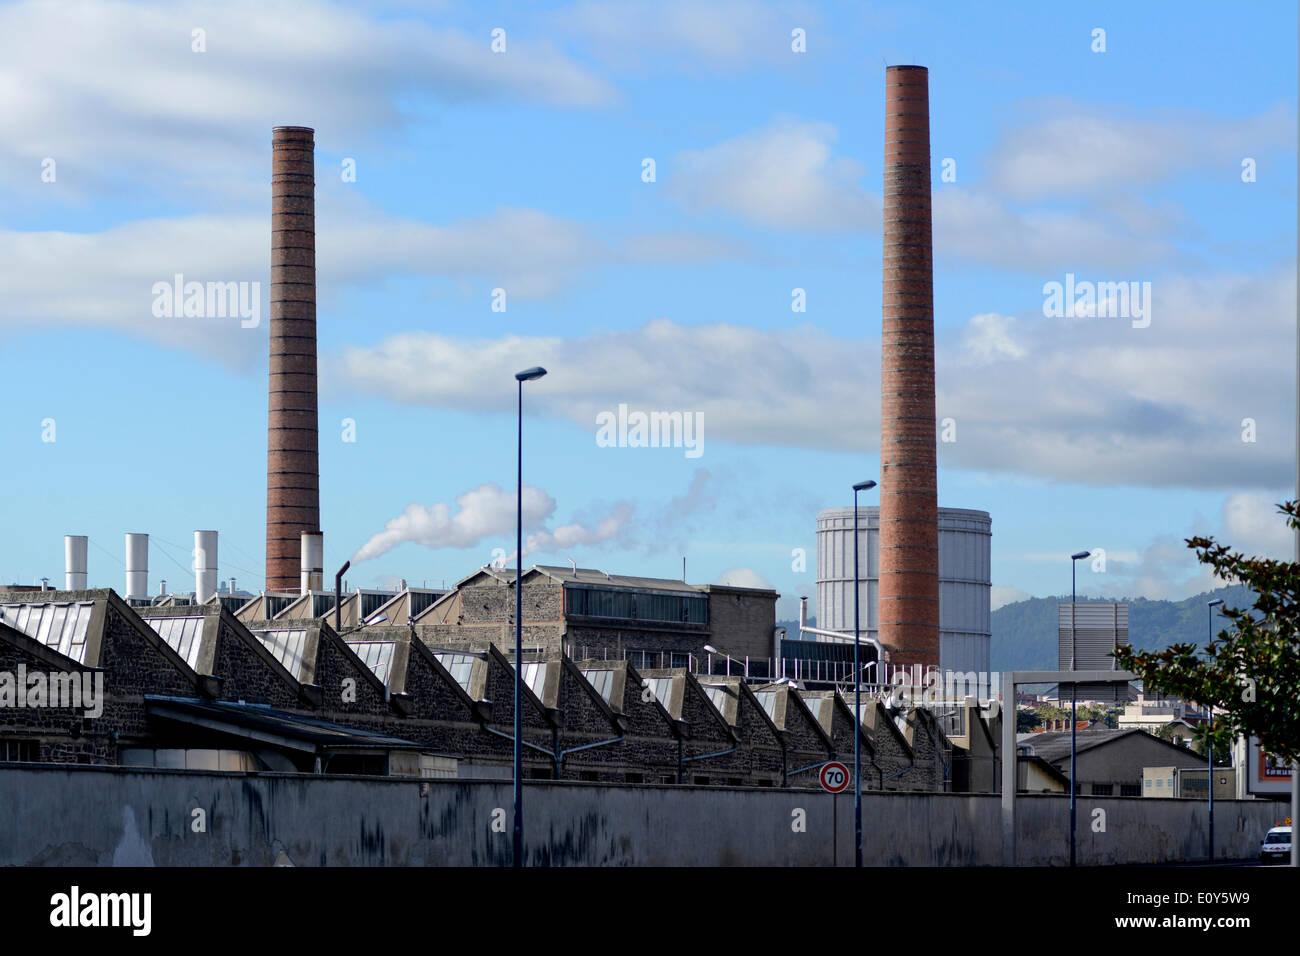 La fábrica de Michelin en Clermont-Ferrand, Francia Imagen De Stock